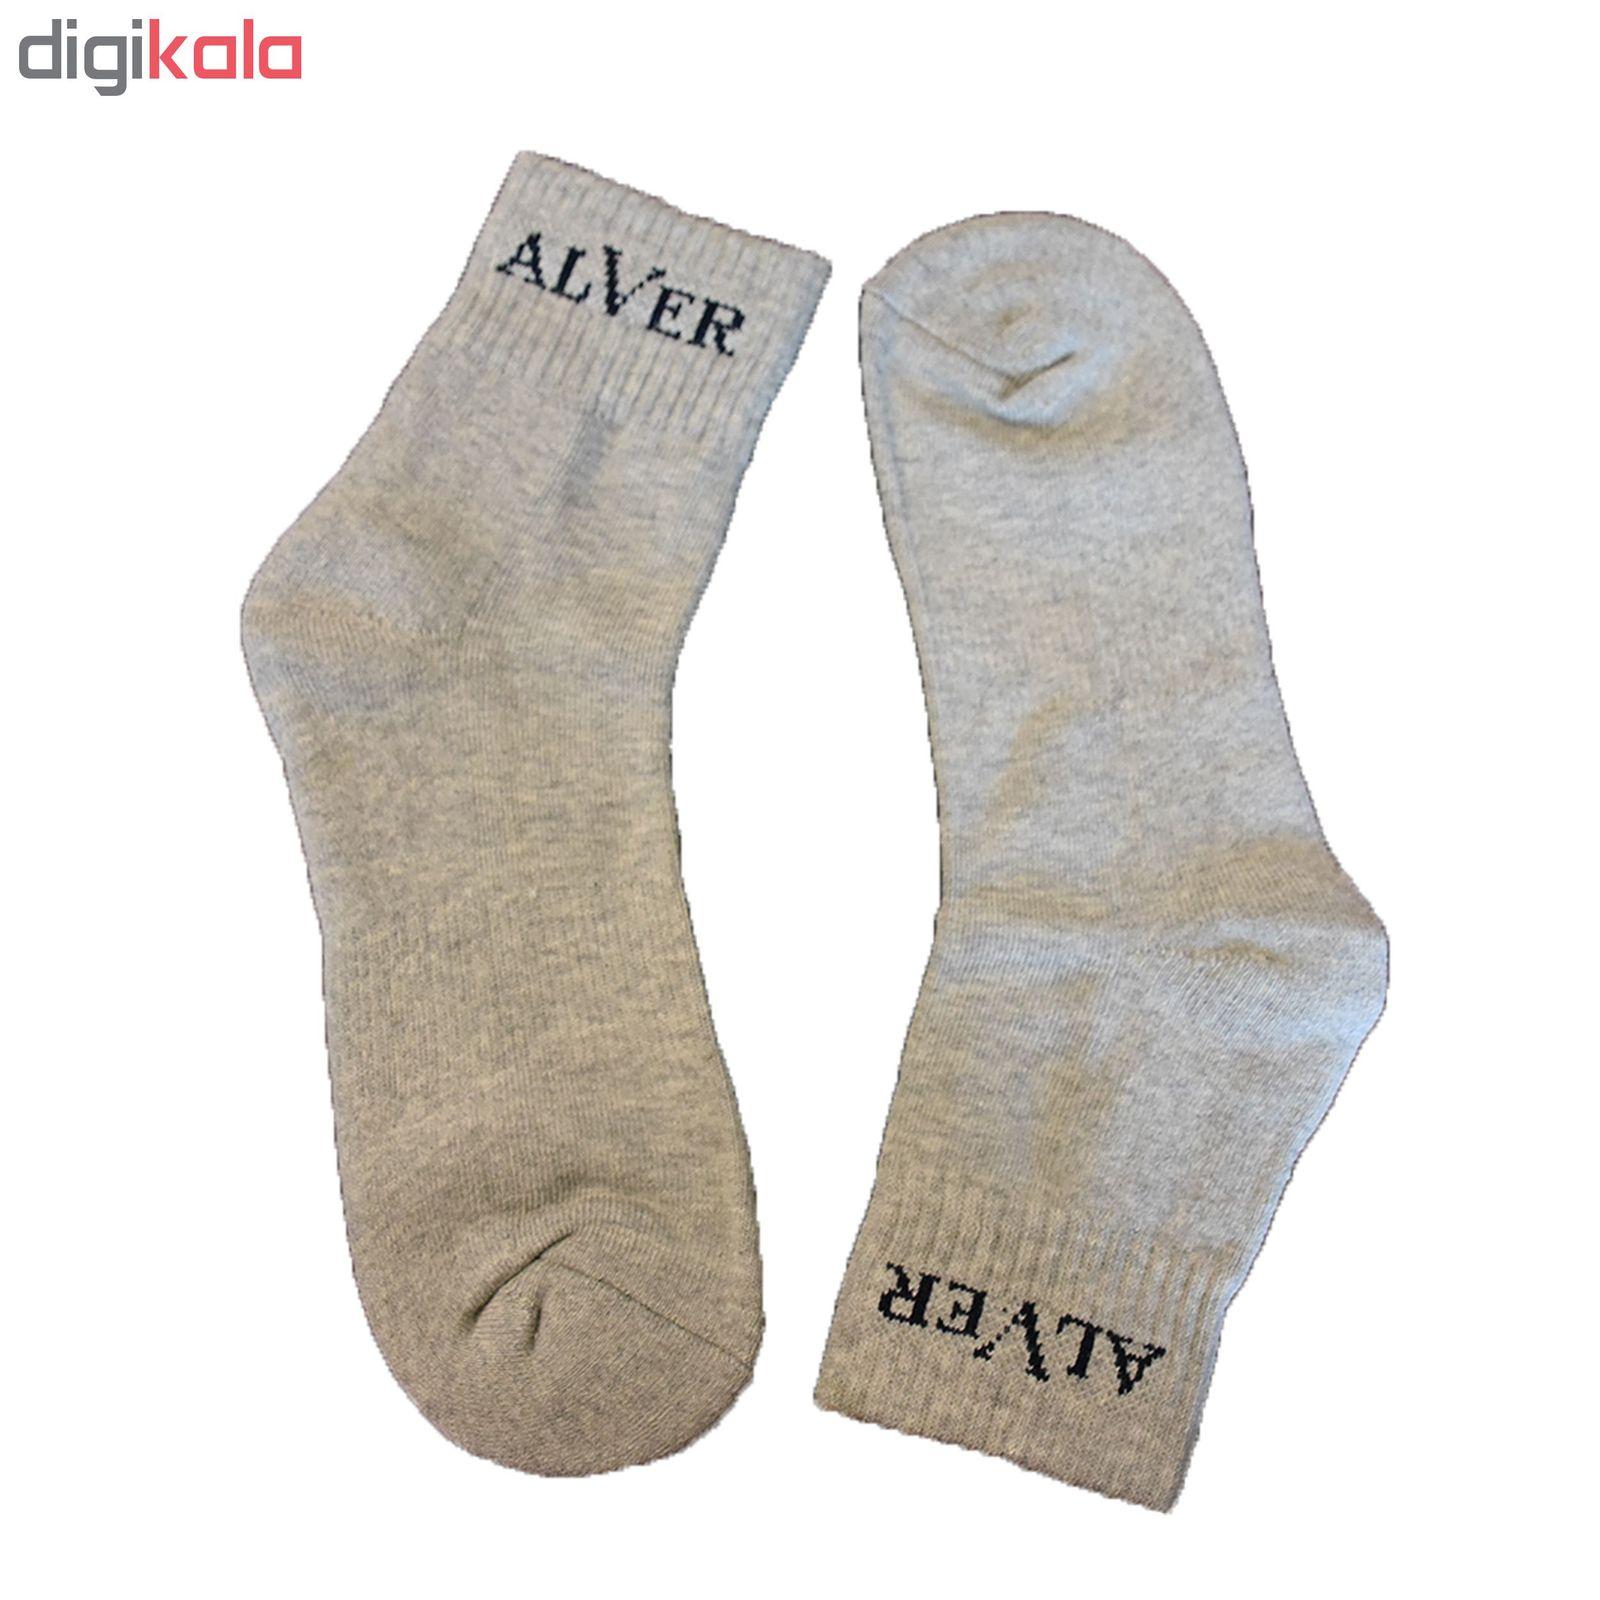 جوراب مردانه آلور کد 002-3 بسته 3 عددی main 1 1